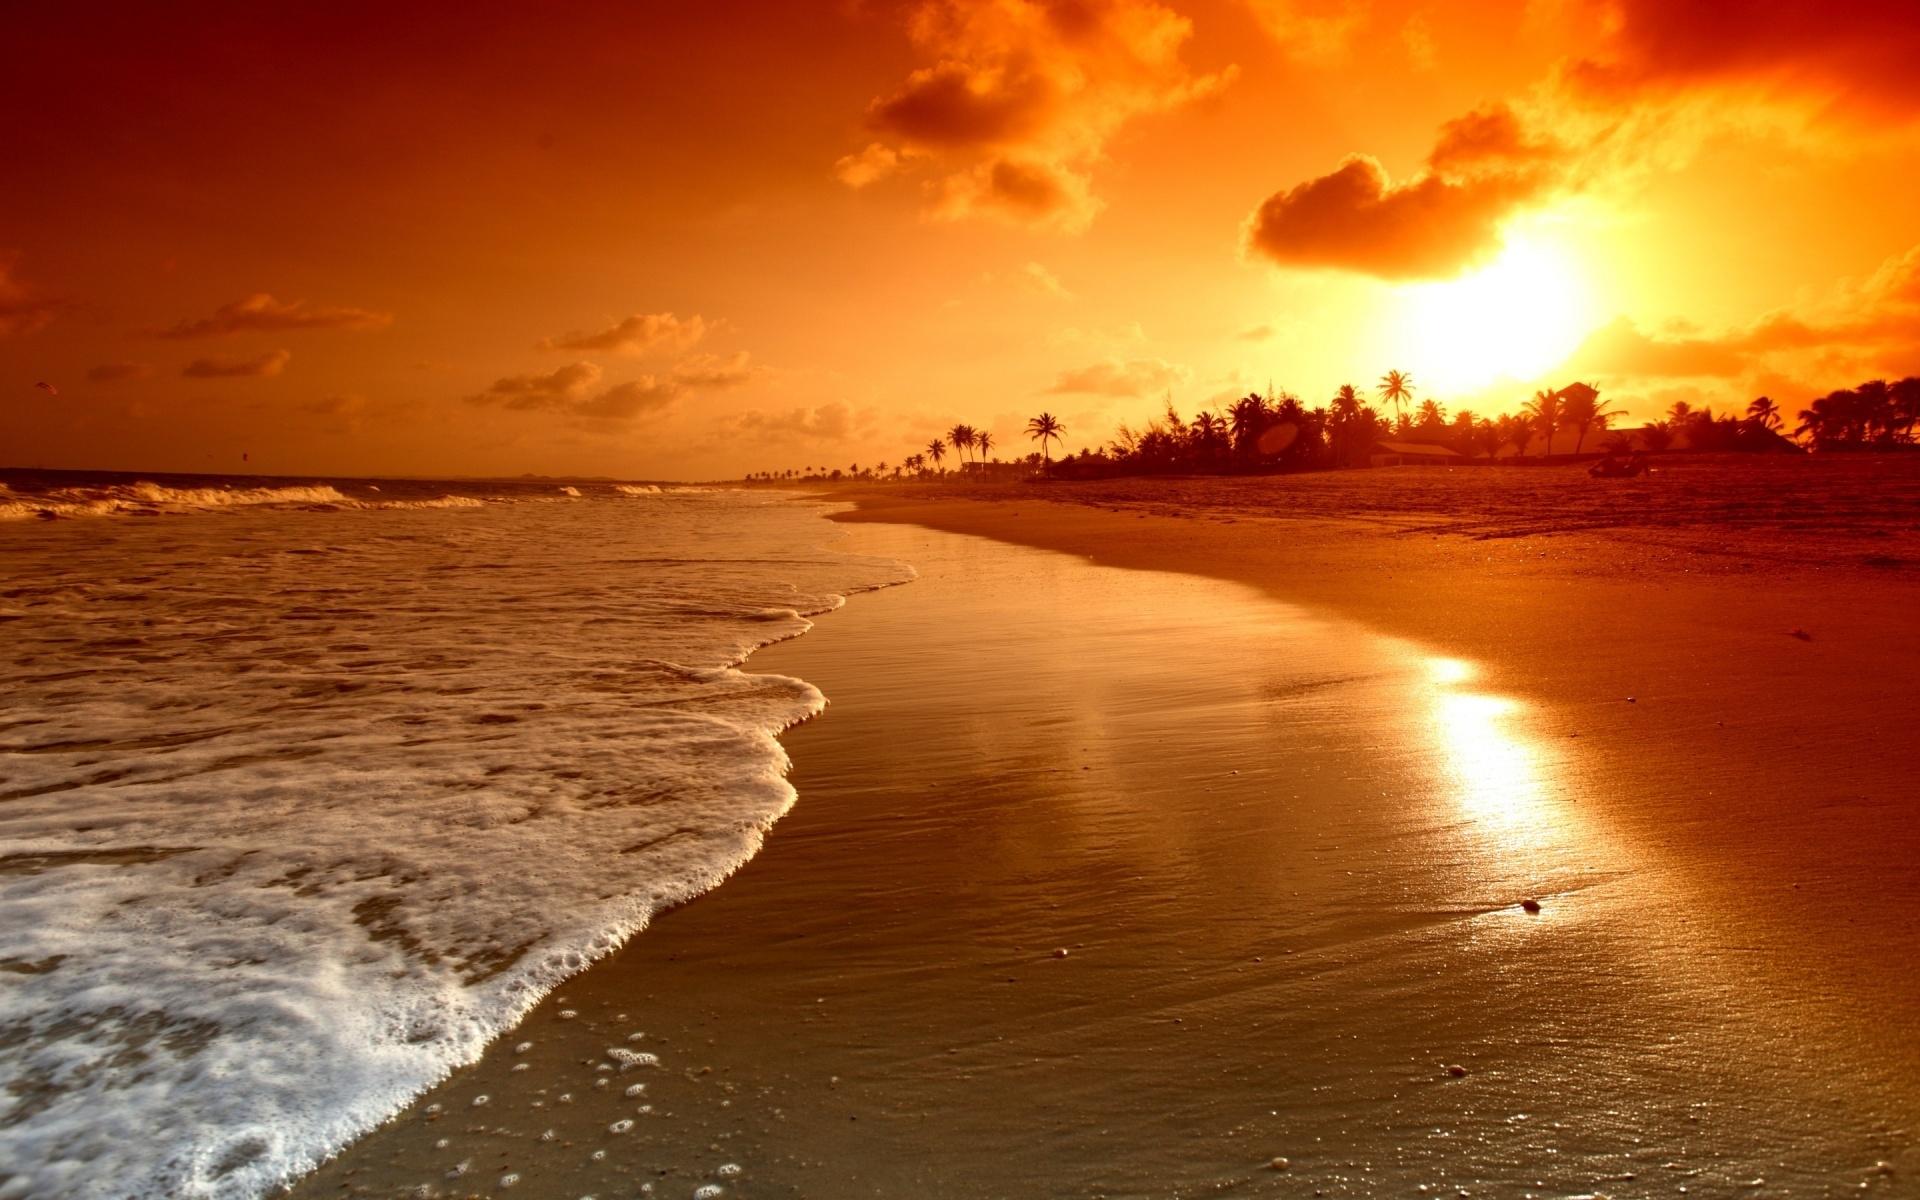 Title Free Beach Sunset Wallpapers Desktop Long Dimension 1920 X 1200 File Type JPG JPEG